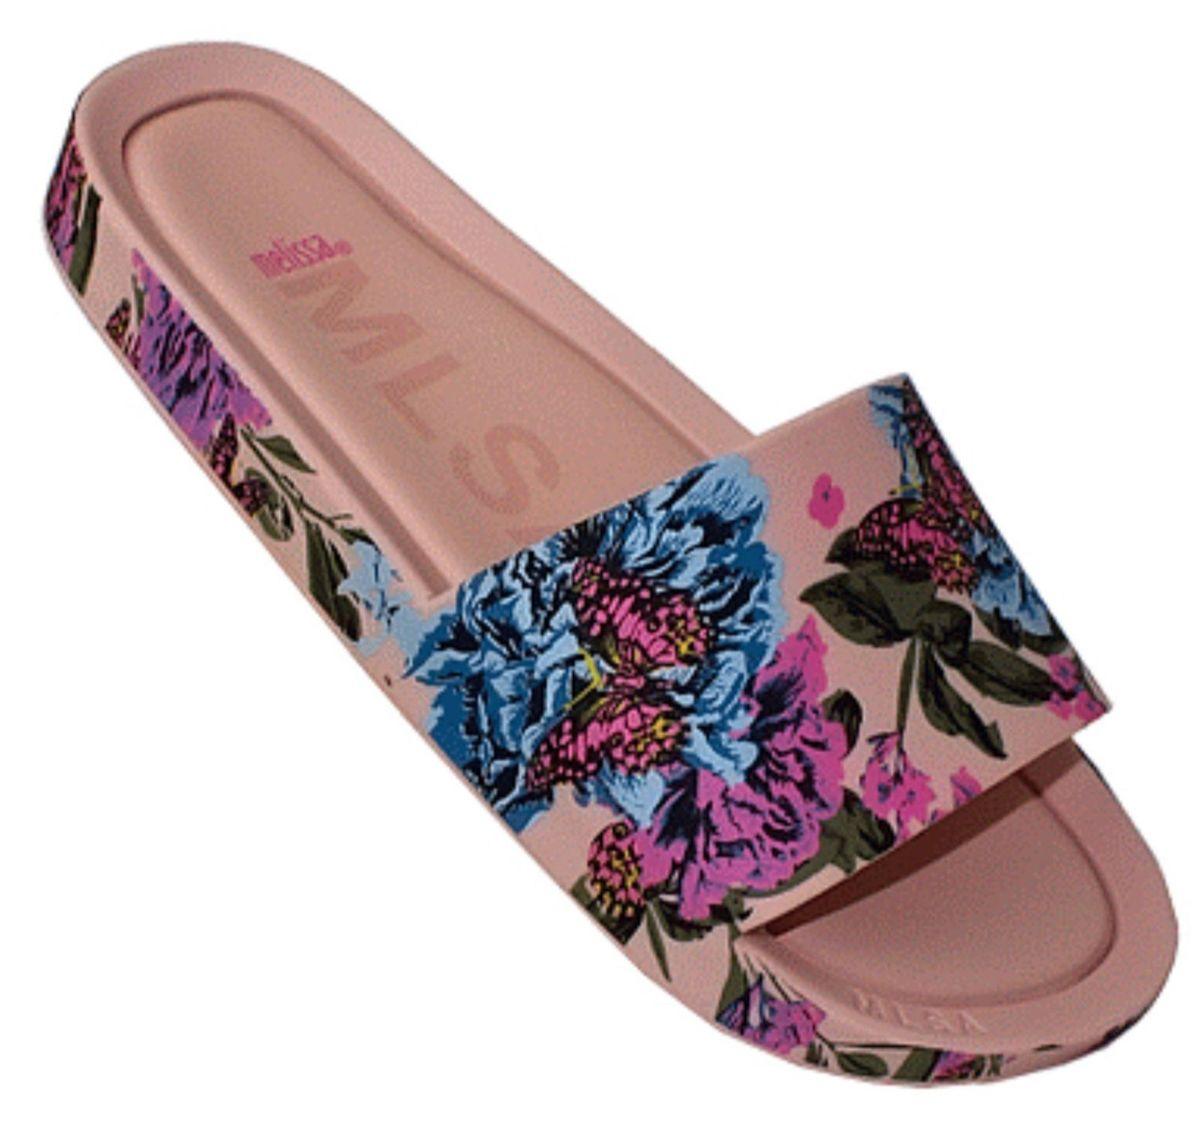 f52f2d681 melissa beach slide rosé - rasteirinha melissa.  Czm6ly9wag90b3muzw5qb2vplmnvbs5ici9wcm9kdwn0cy8xmdqxotyxns84y2i4ngi5mzbkota3ntyxodq3zjrizte1otgyytzhny5qcgc